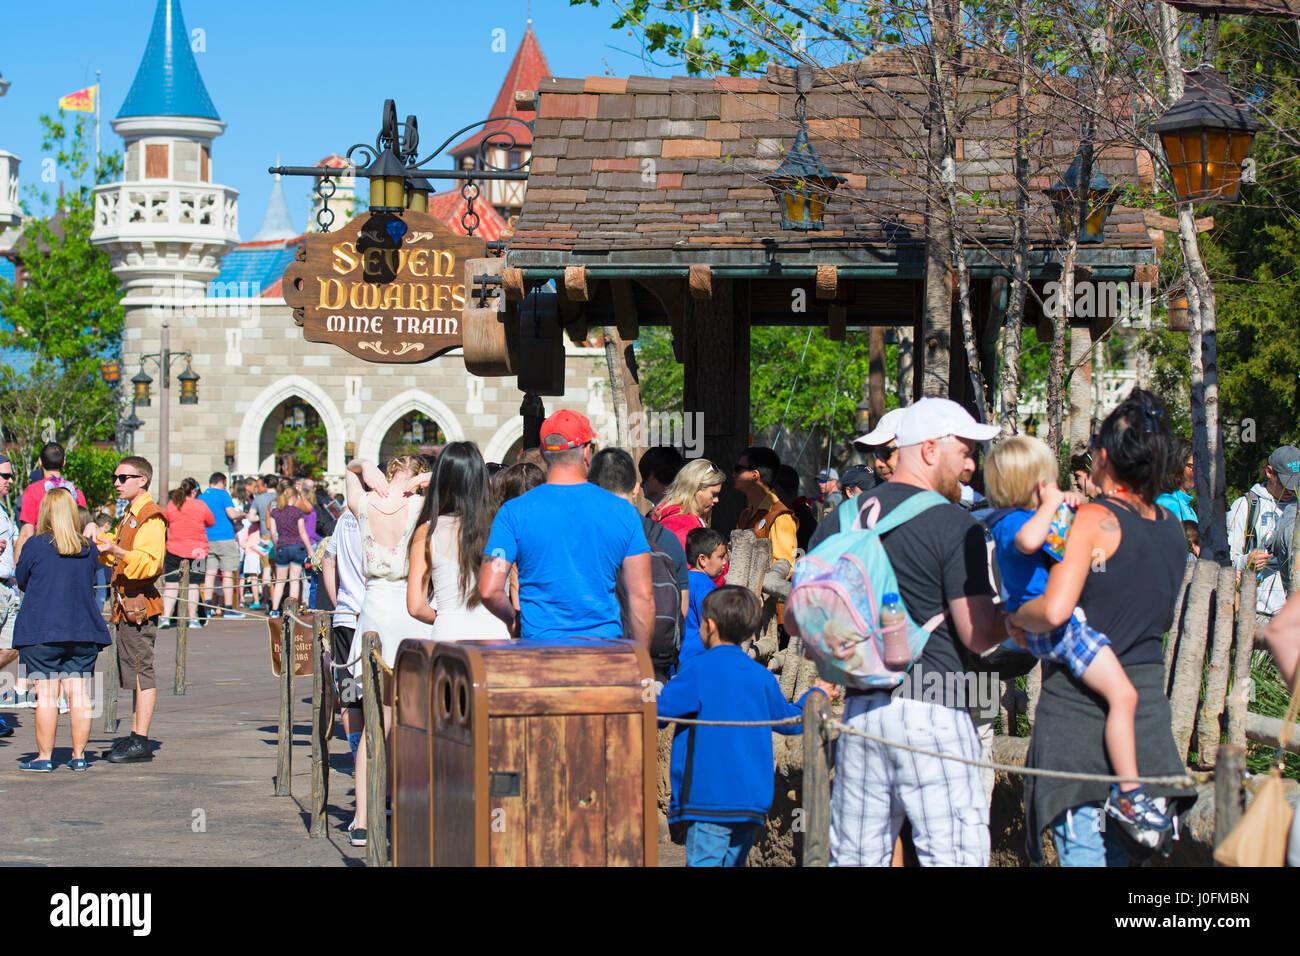 Queue for Seven Dwarfs Mine Train ride Family Children, Disney World, Magic Kingdom, Orlando Florida - Stock Image